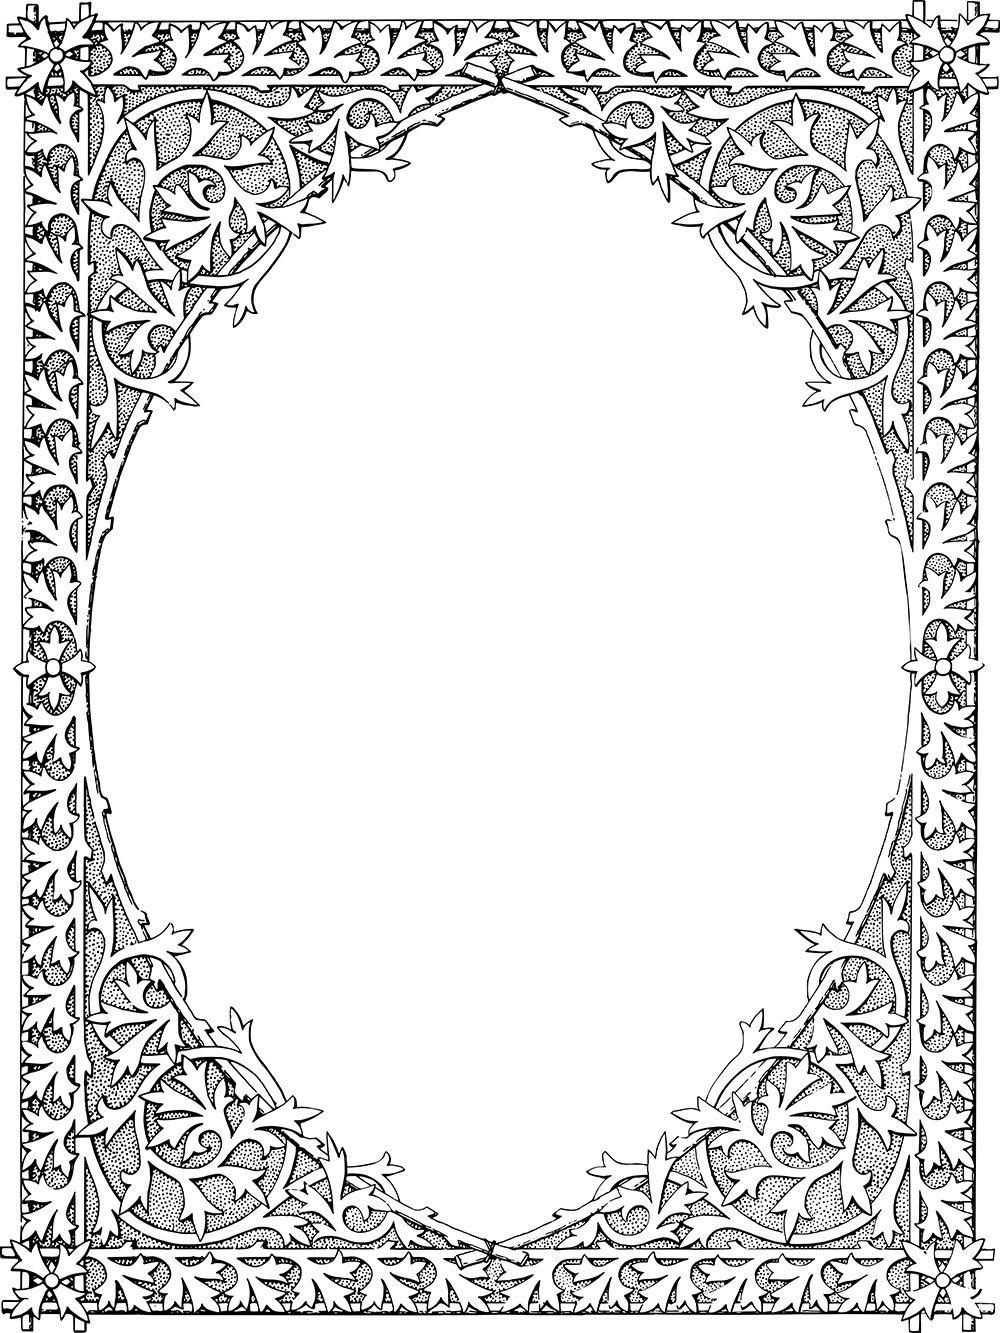 Magnificent Vintage Gothic Frame Border Vintage Gothic Gothic Pattern Ornaments Design